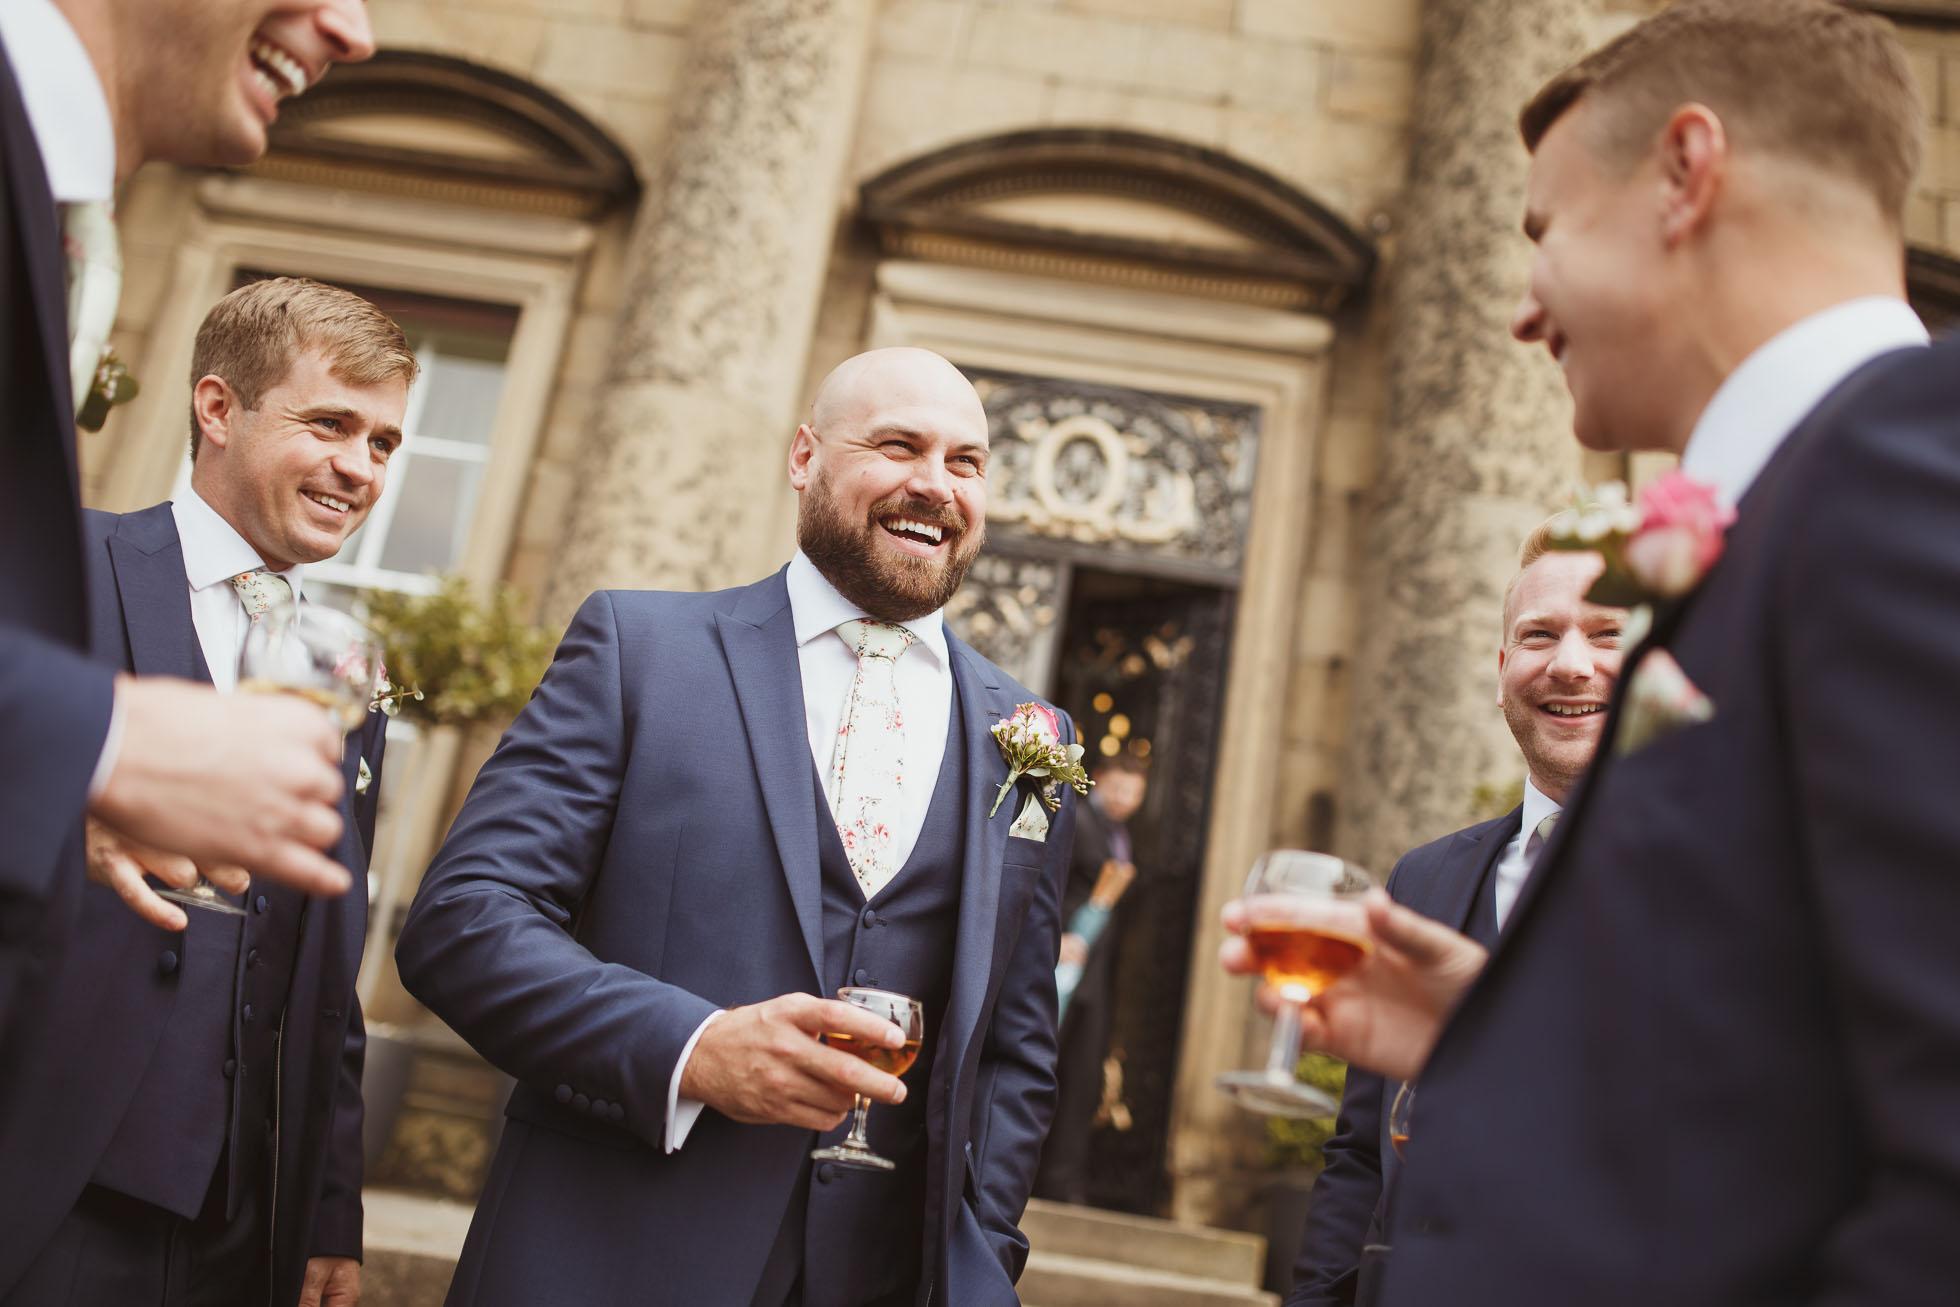 denton-hall-wedding-photographer-17.jpg